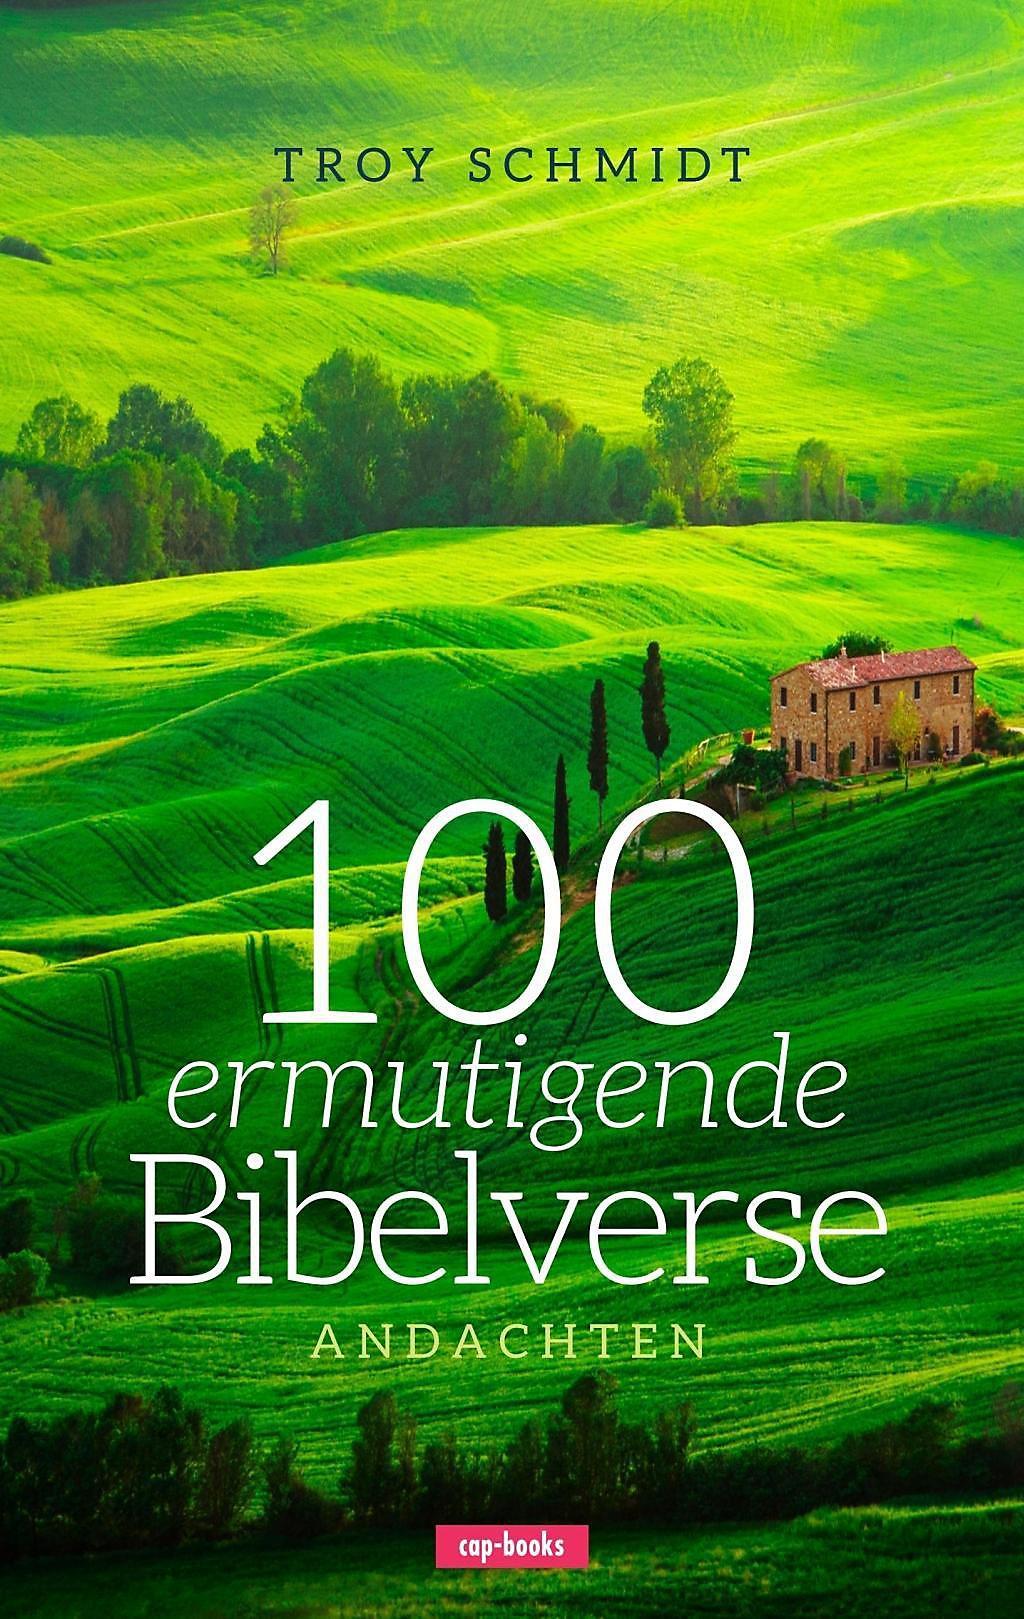 100 ermutigende Bibelverse - Andachten Buch portofrei - Weltbild.de